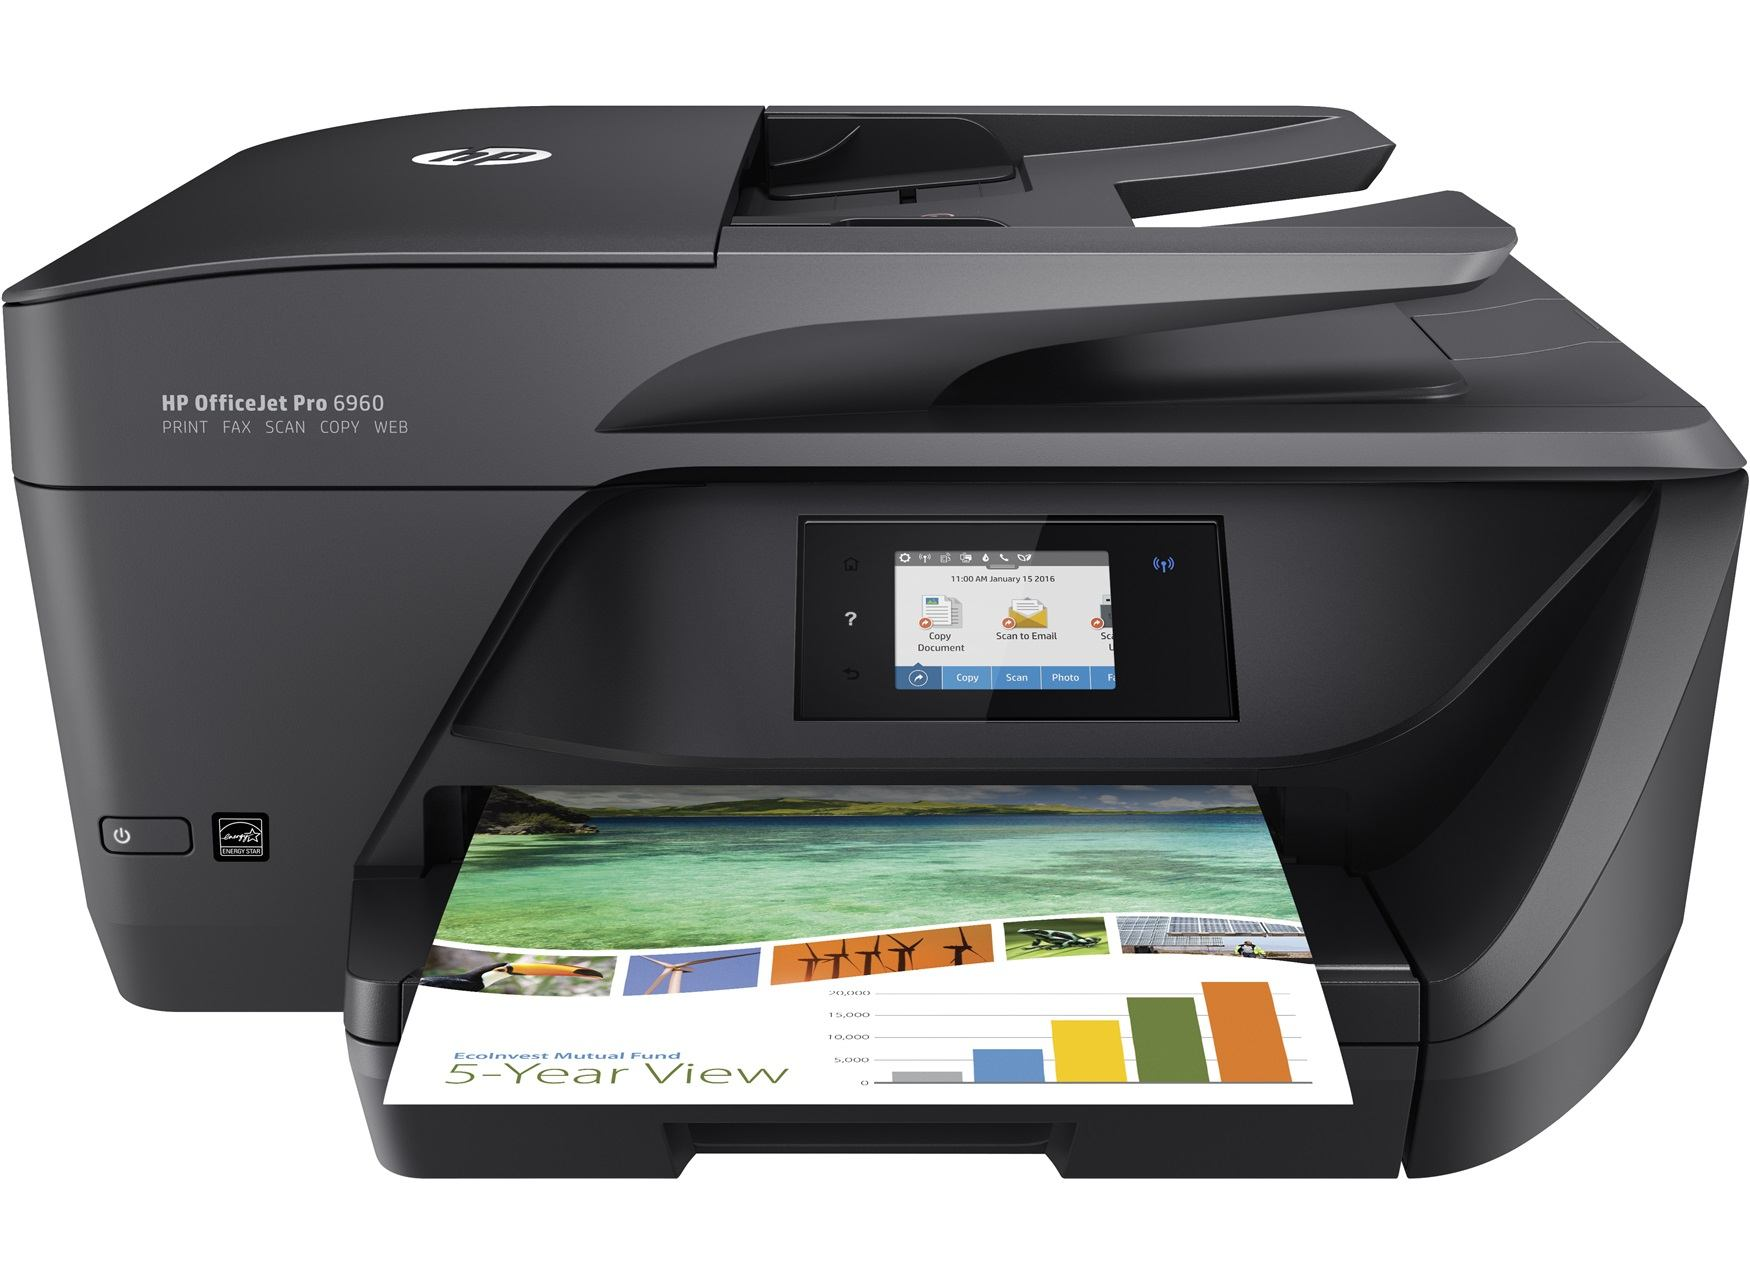 2061284-HP-OfficeJet-Pro-6960-Ad-inchiostro-600-x-1200-DPI-18-ppm-A4-Wi-Fi-Offi